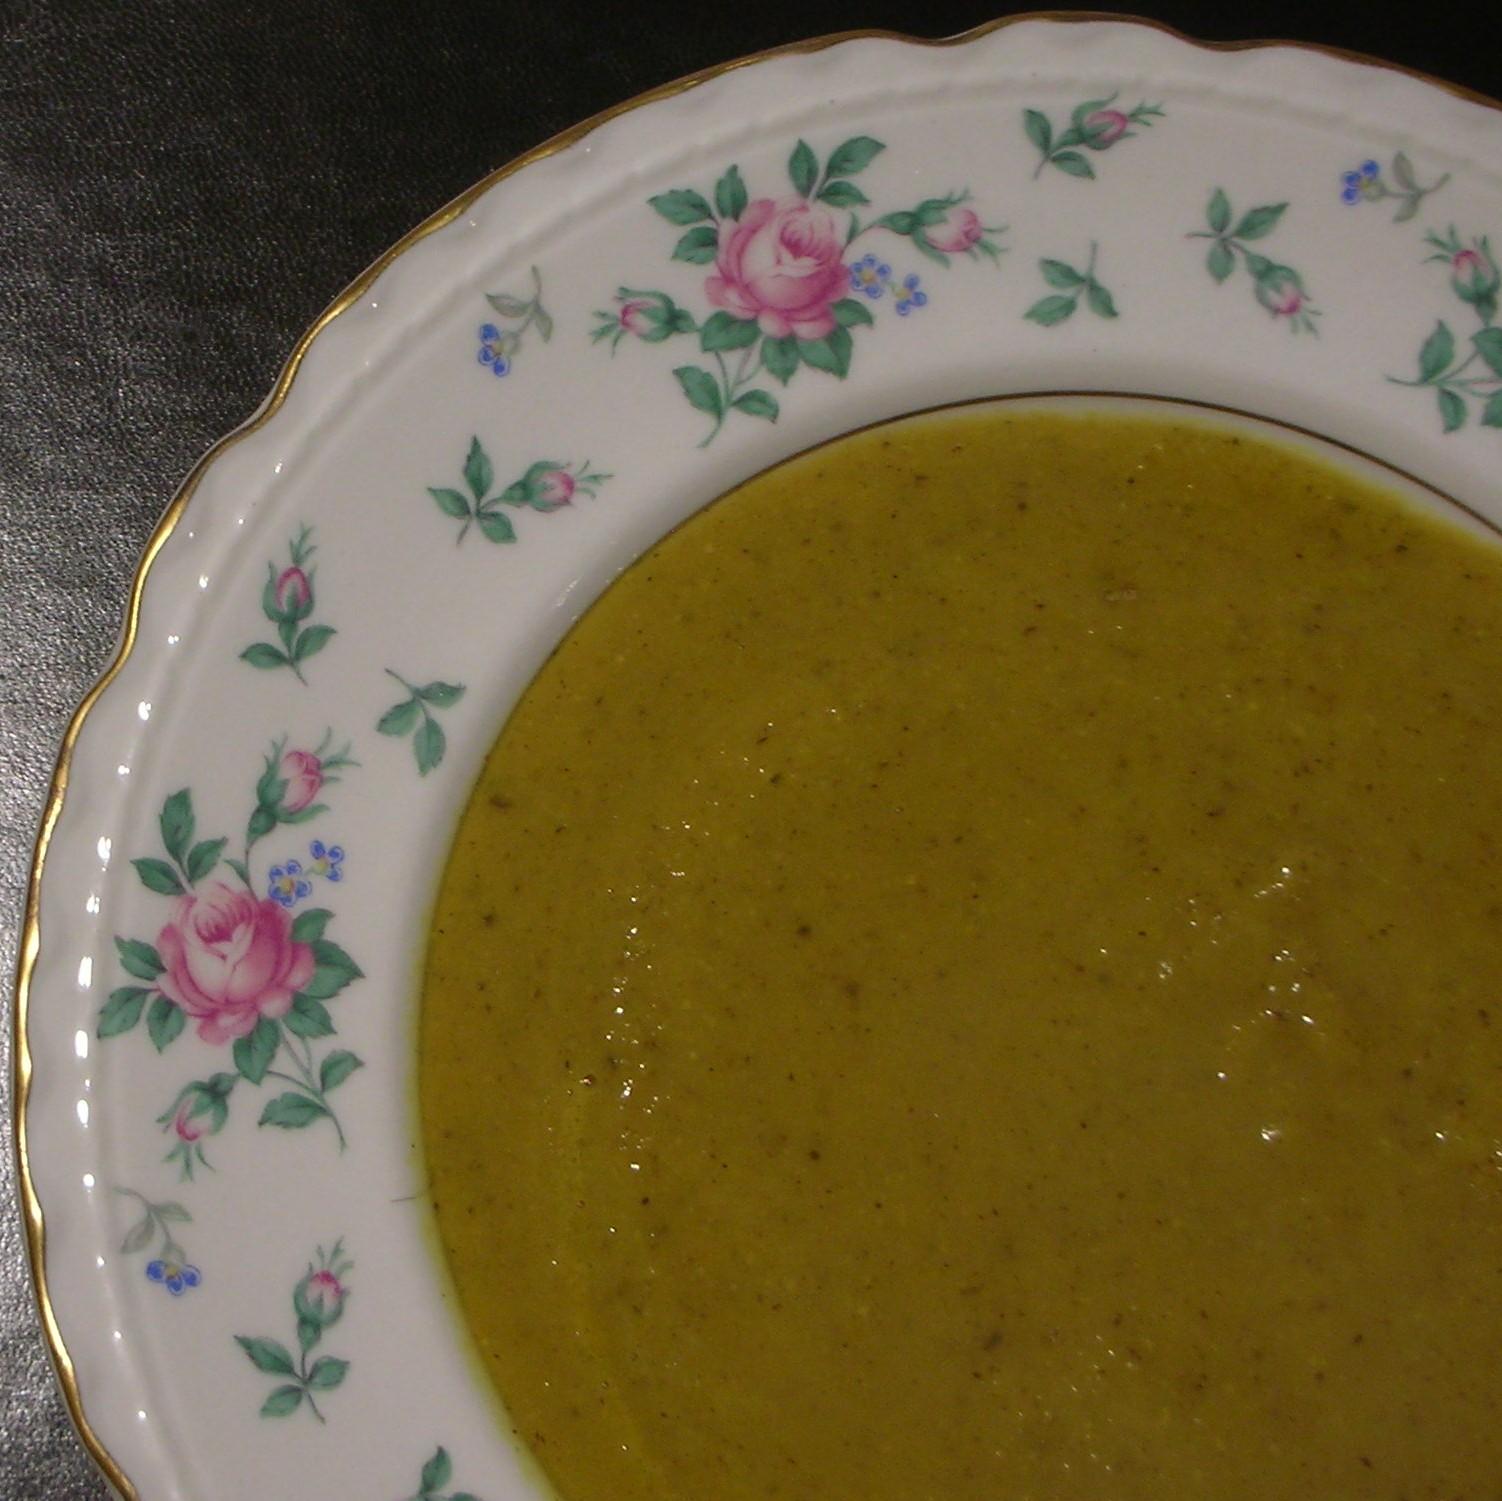 Cauliflower Soup with Turmeric and Hazelnuts/Soupe de Chou-Fleur, Curcuma, et Noisette